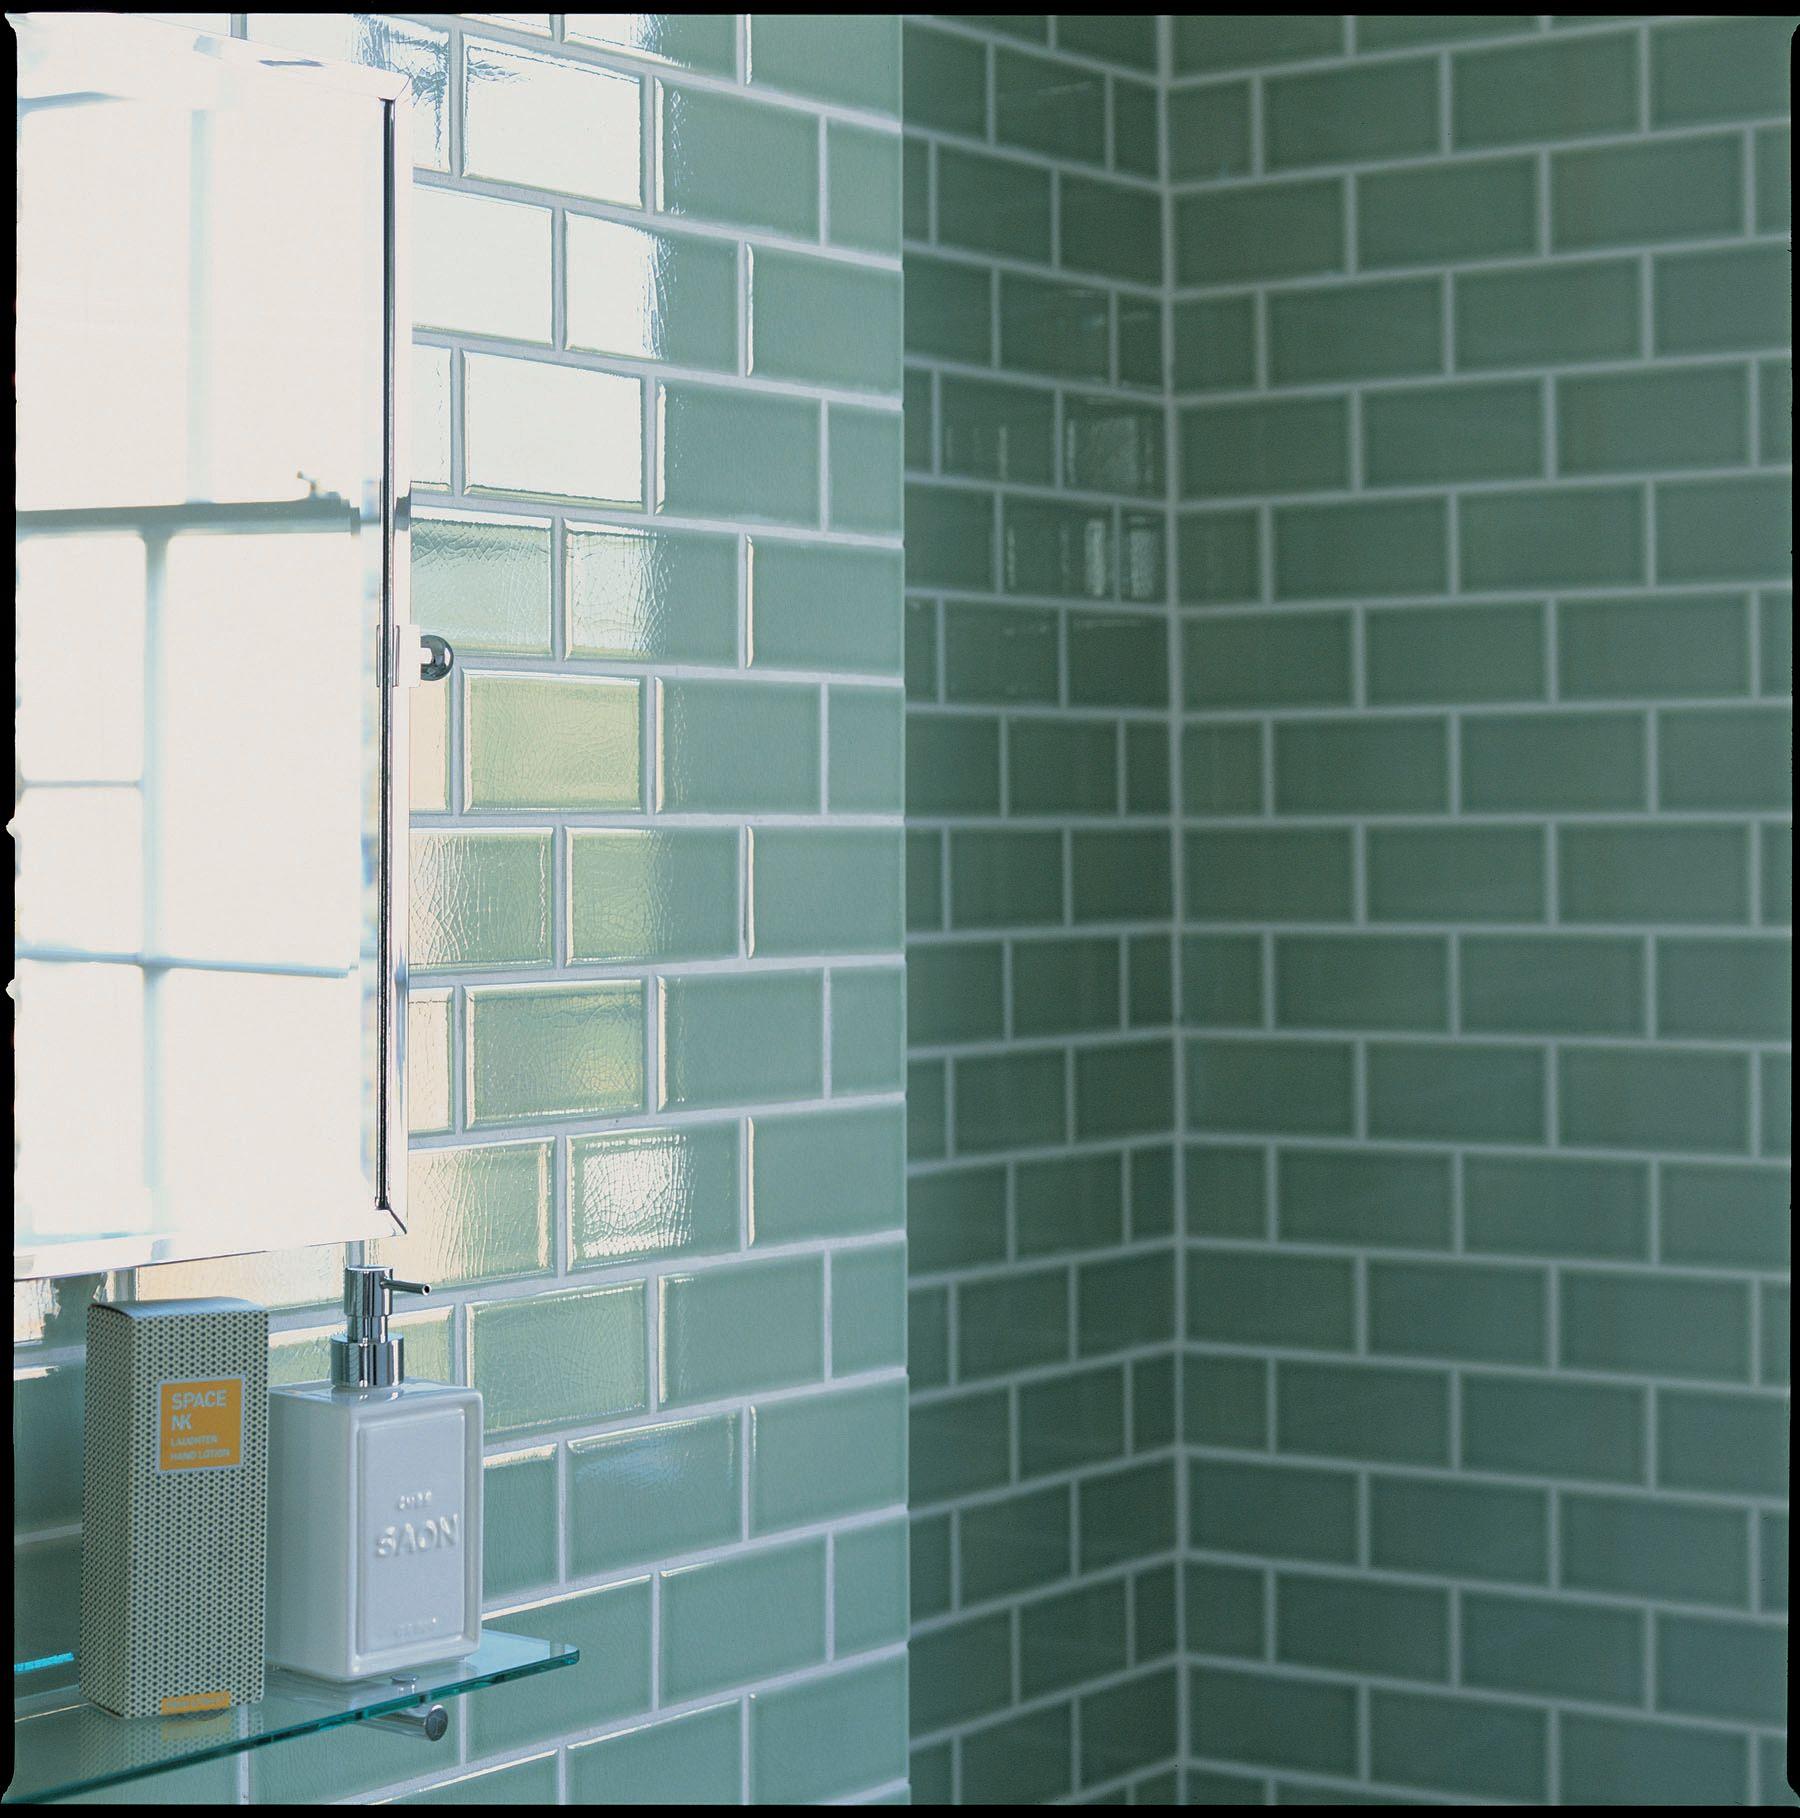 Green Glass Tile Bathroom: Best 25+ Green Bathroom Tiles Ideas On Pinterest